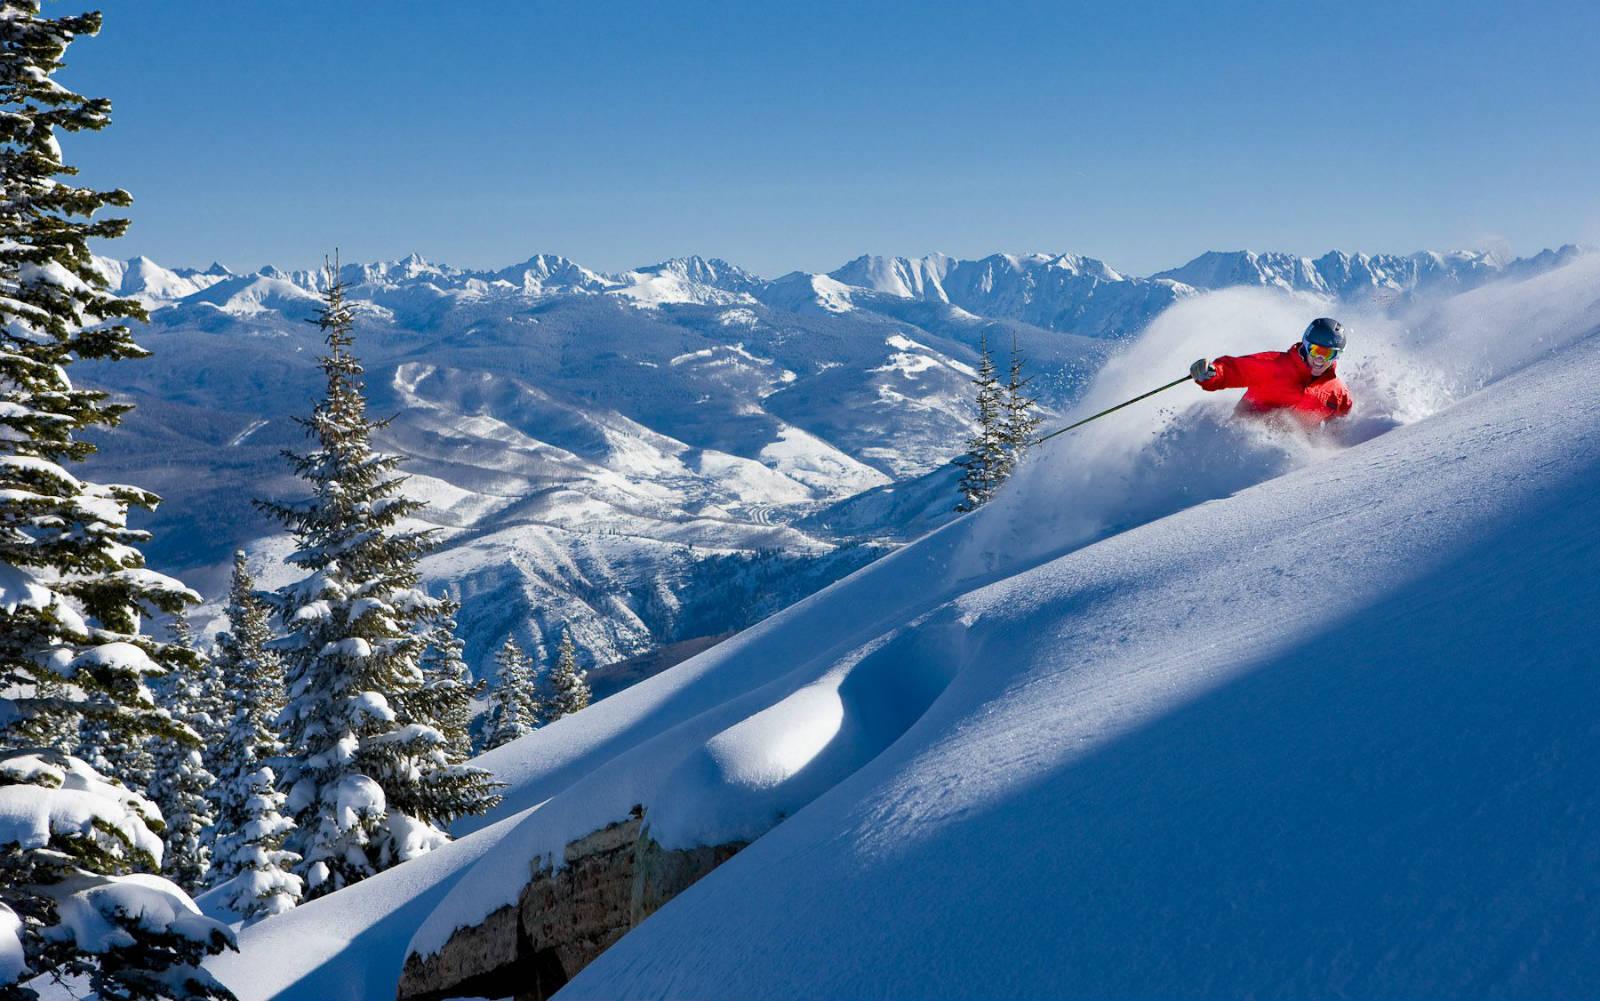 USA-Ski-Resorts-Colorado-Beaver-Creek-Po